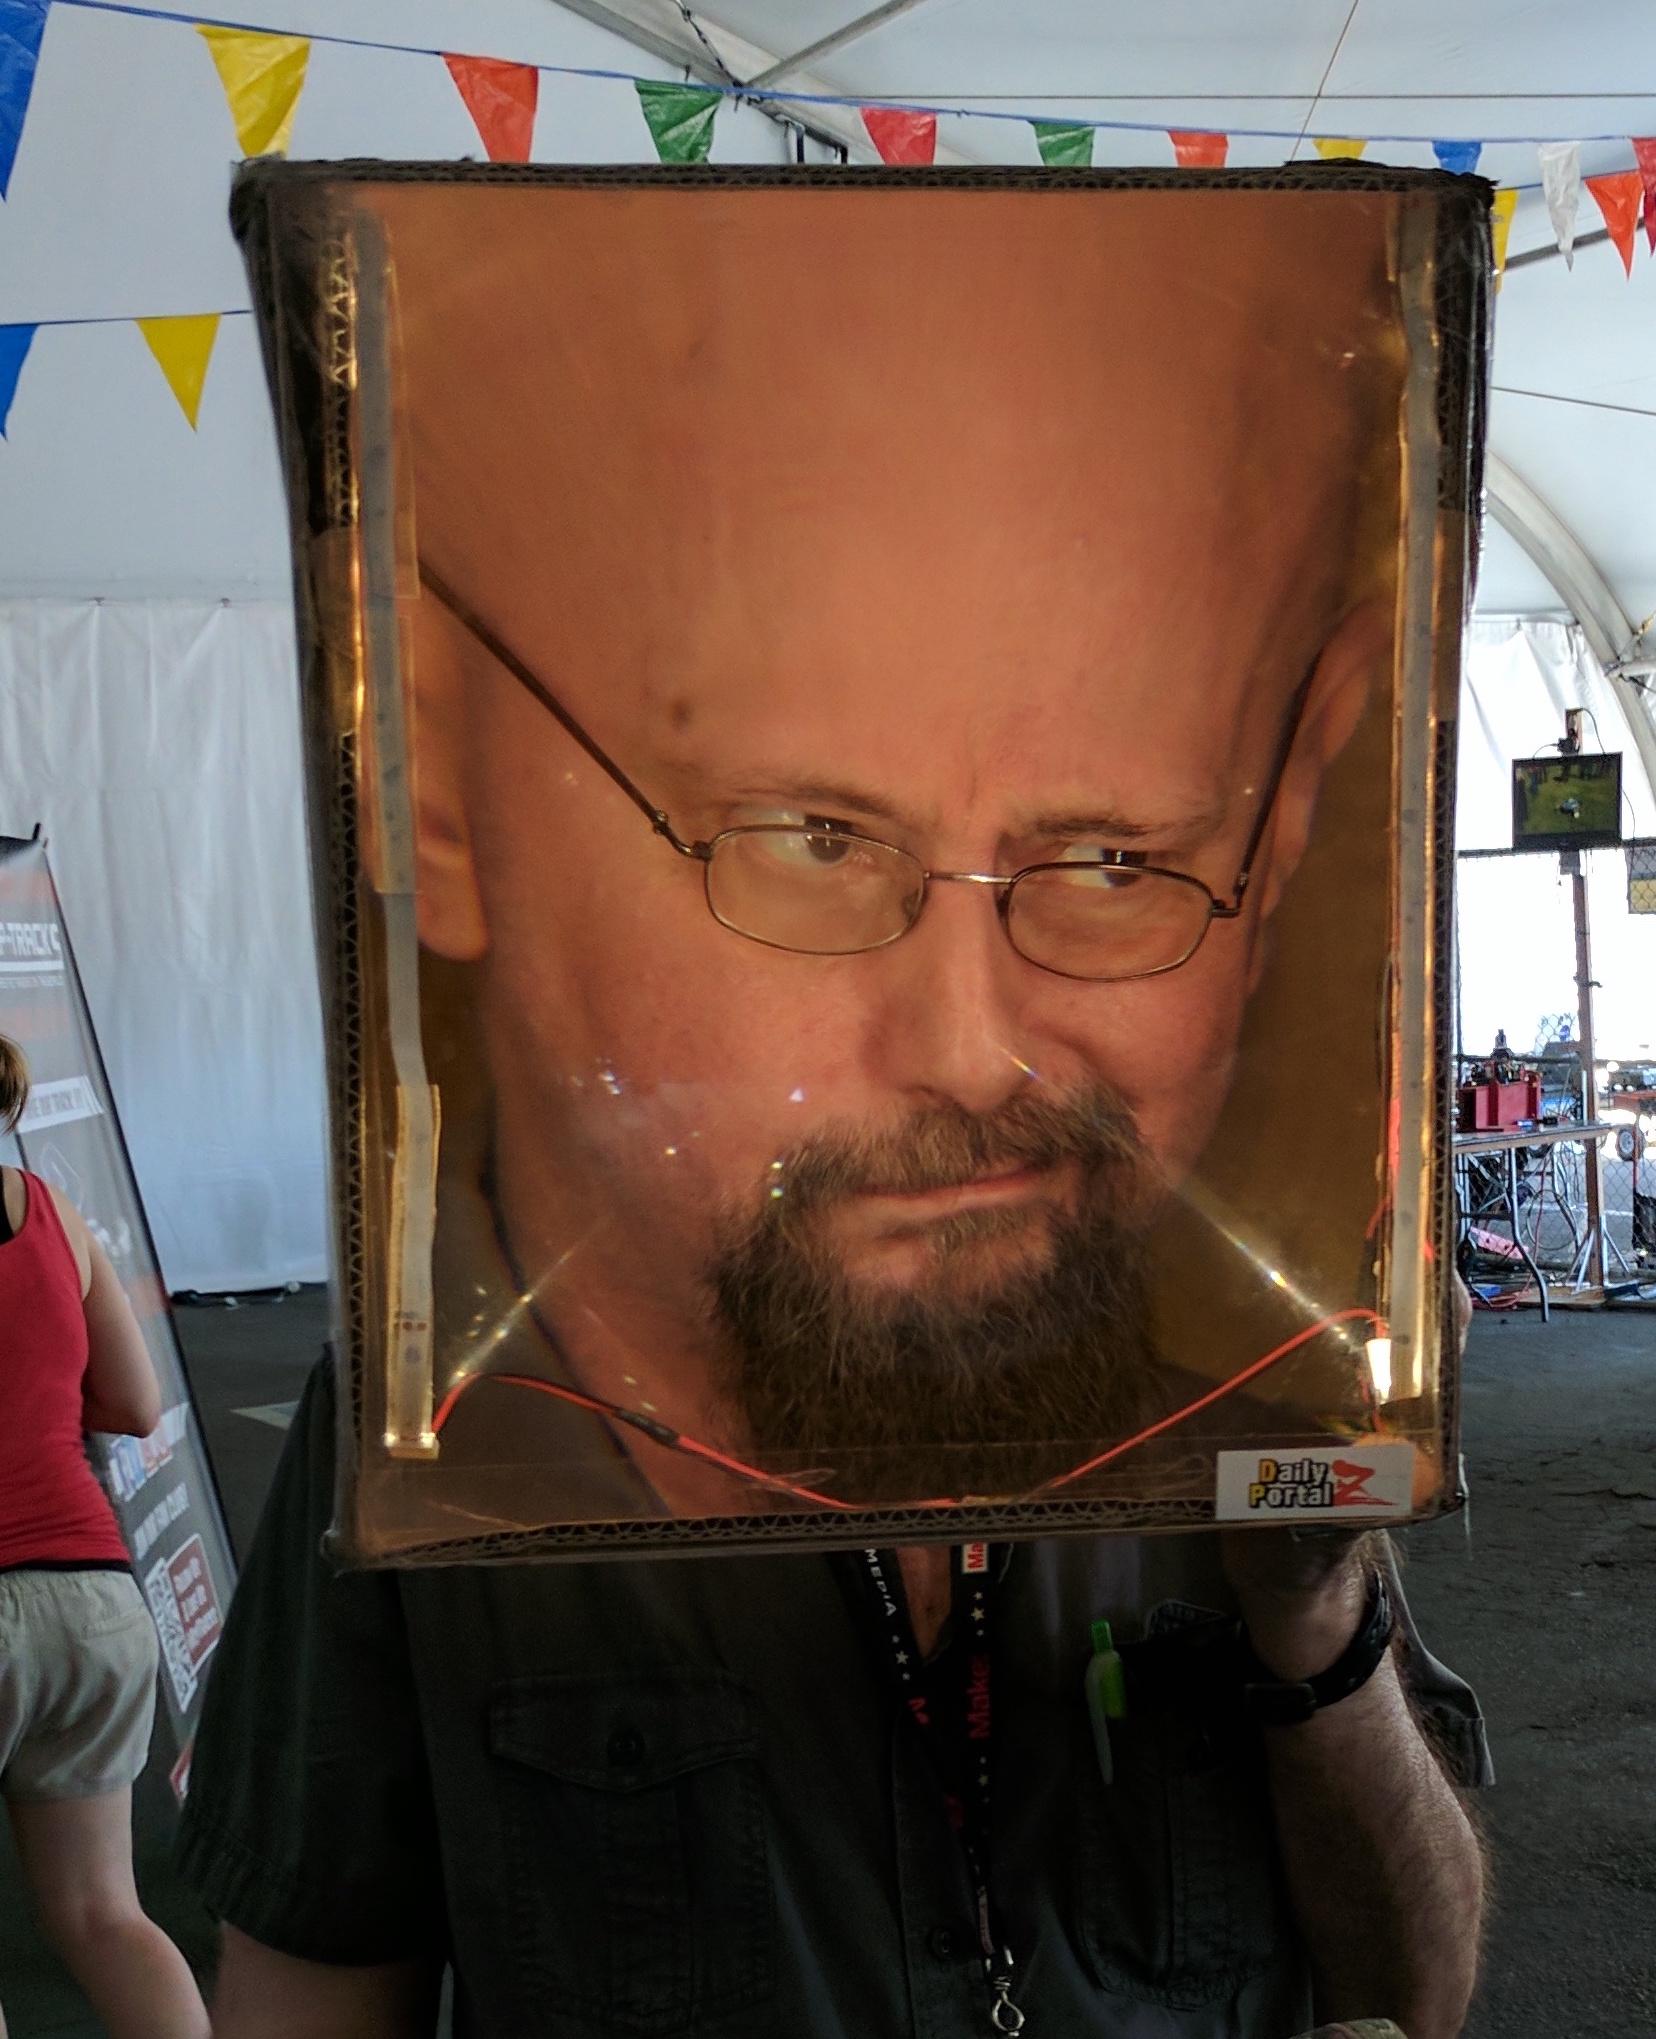 Bigfacebox, a Simple Way to Gigantify Your Head